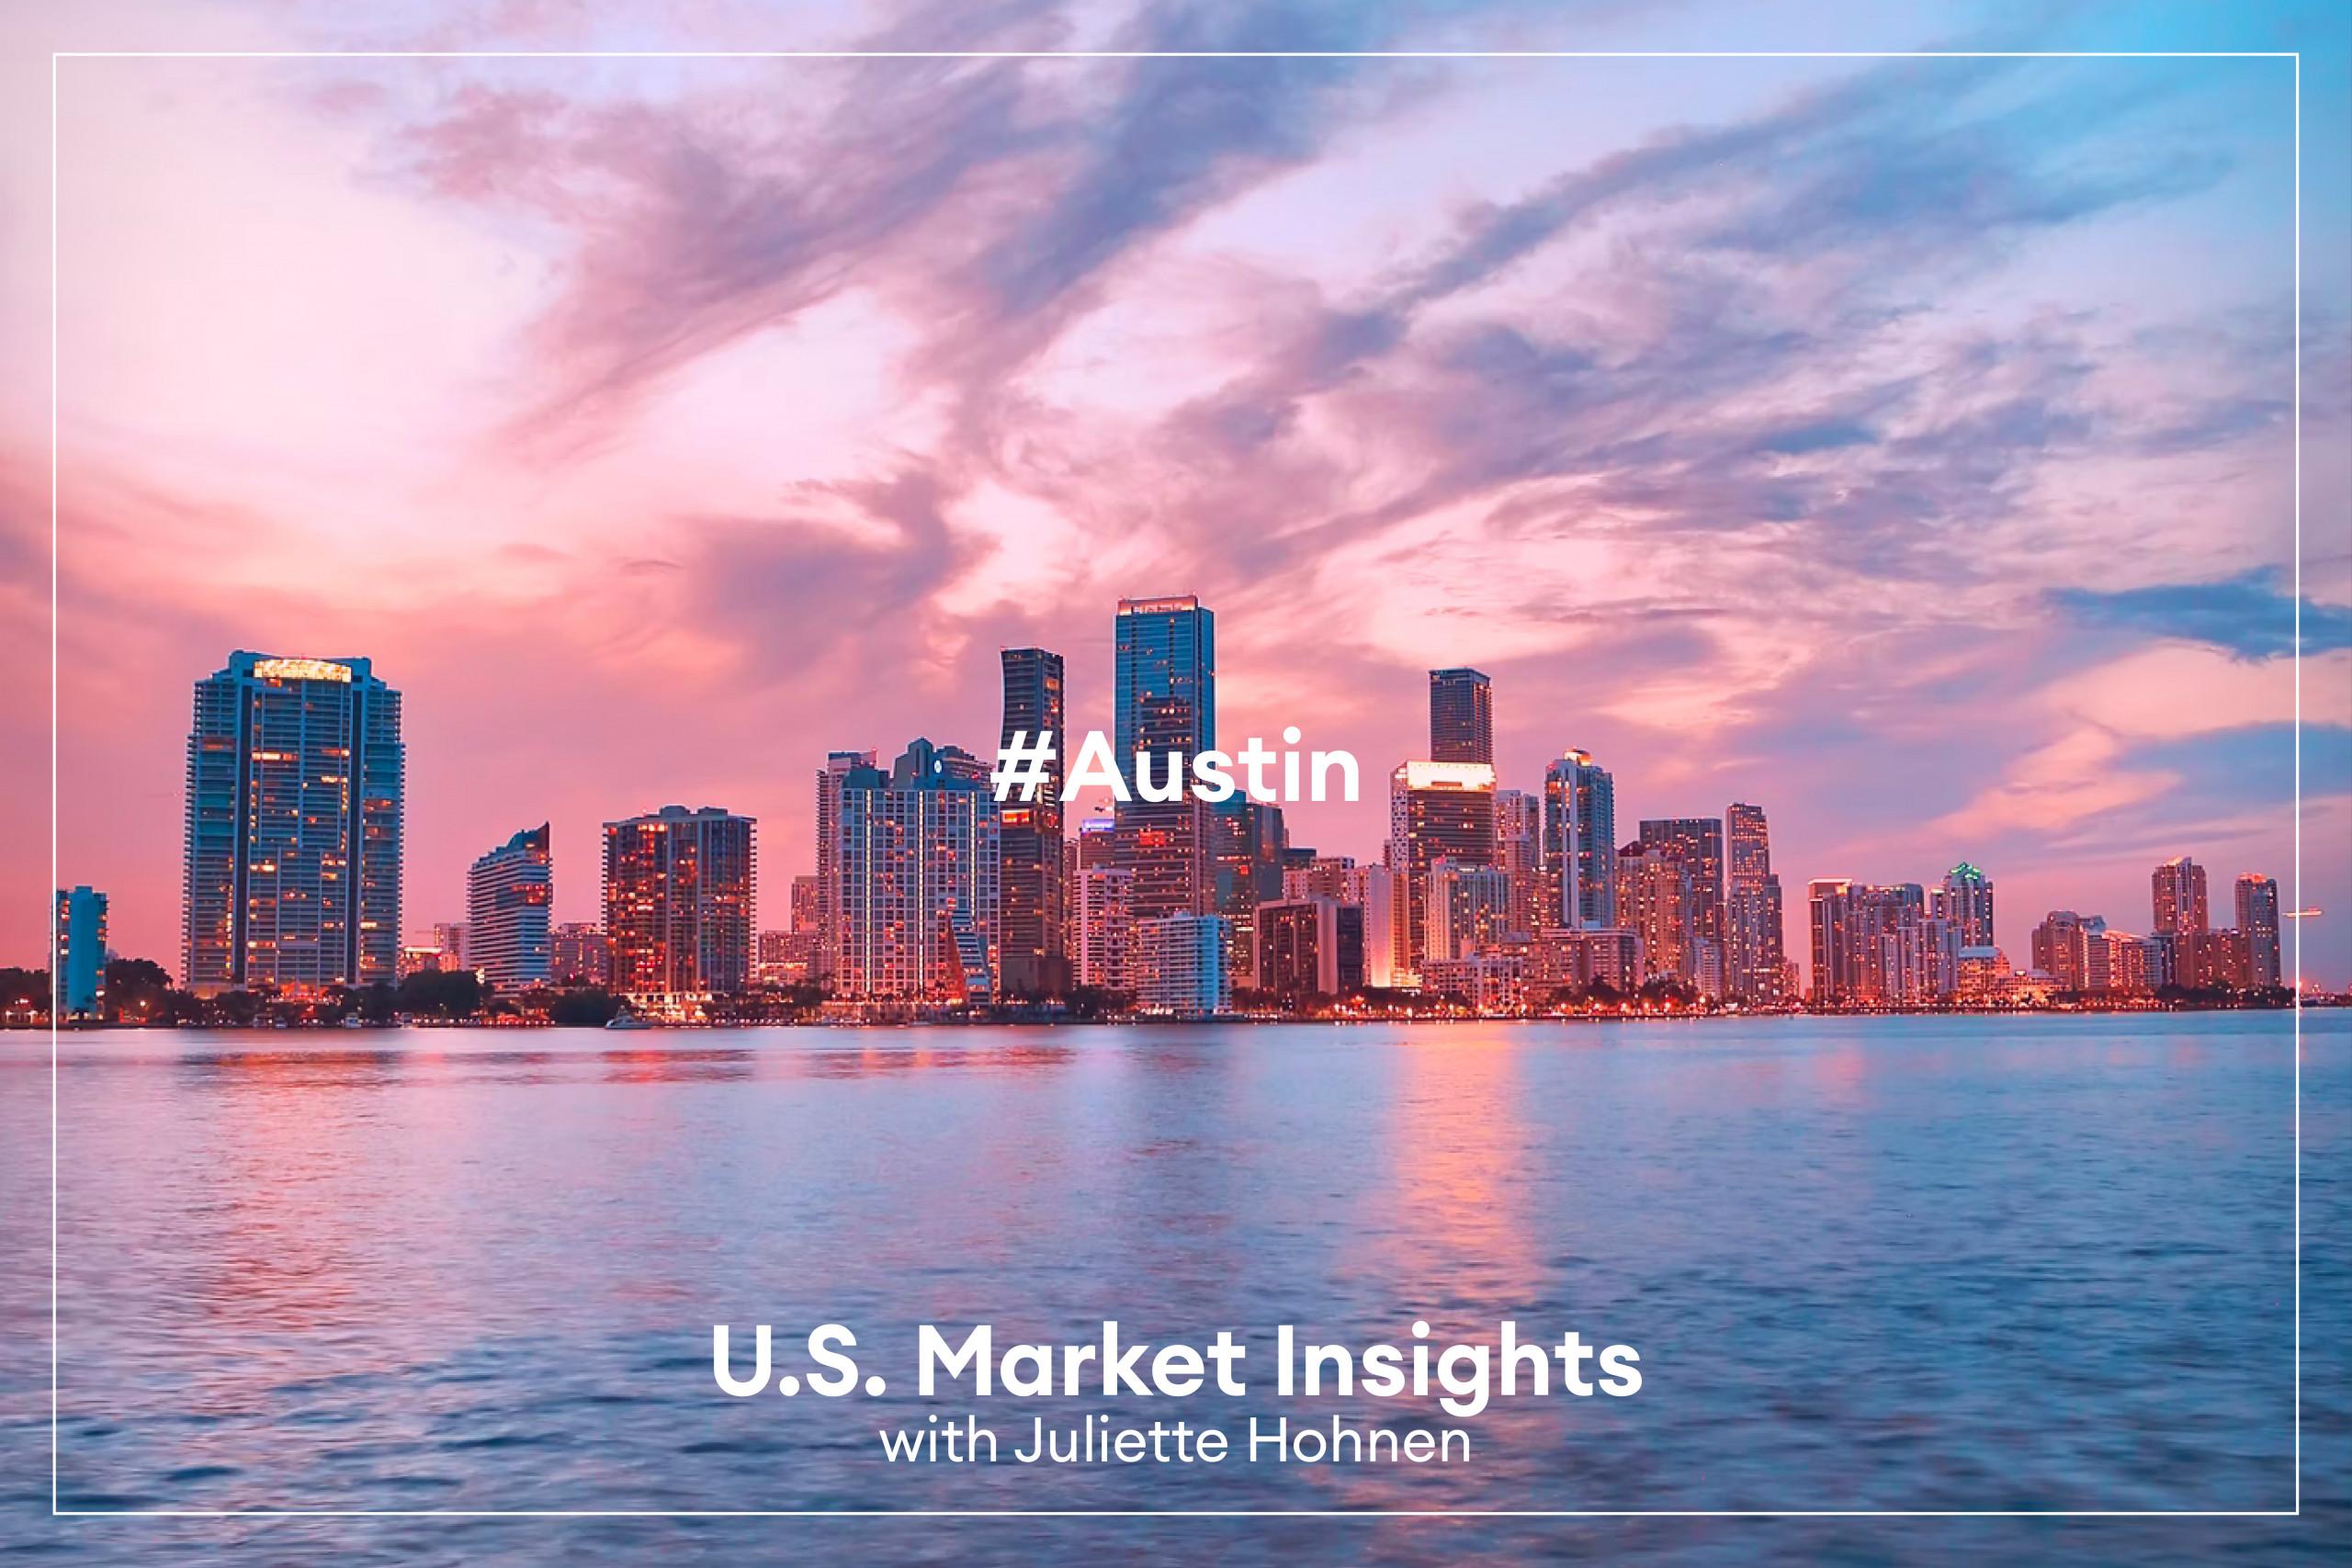 U.S. Market Insights | Why Move to Austin?